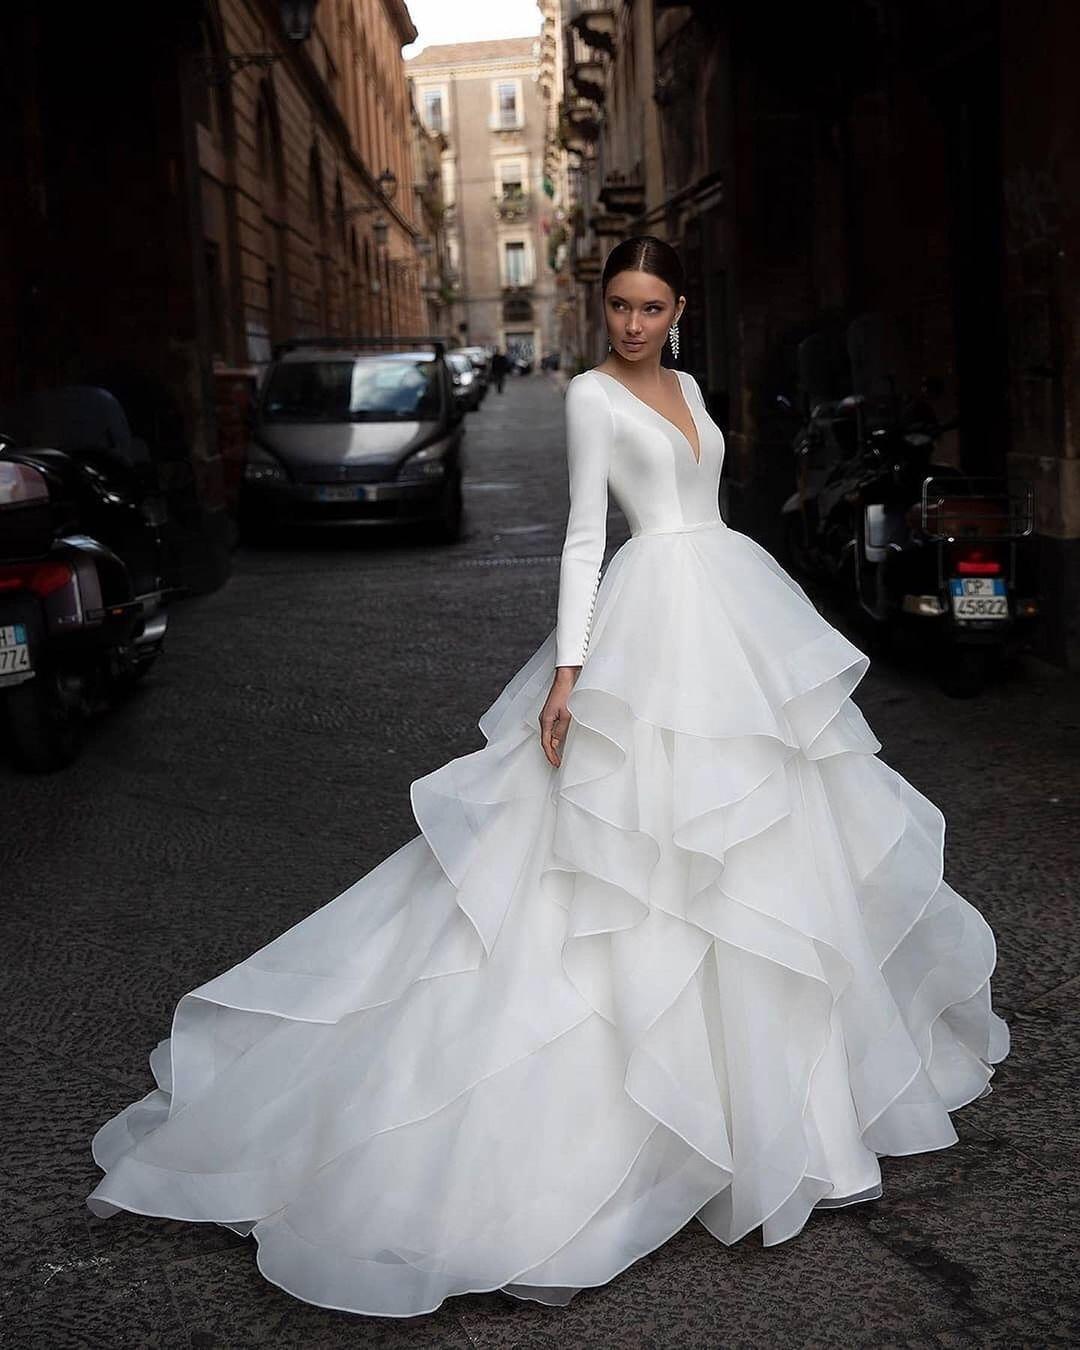 The Lolanda dress